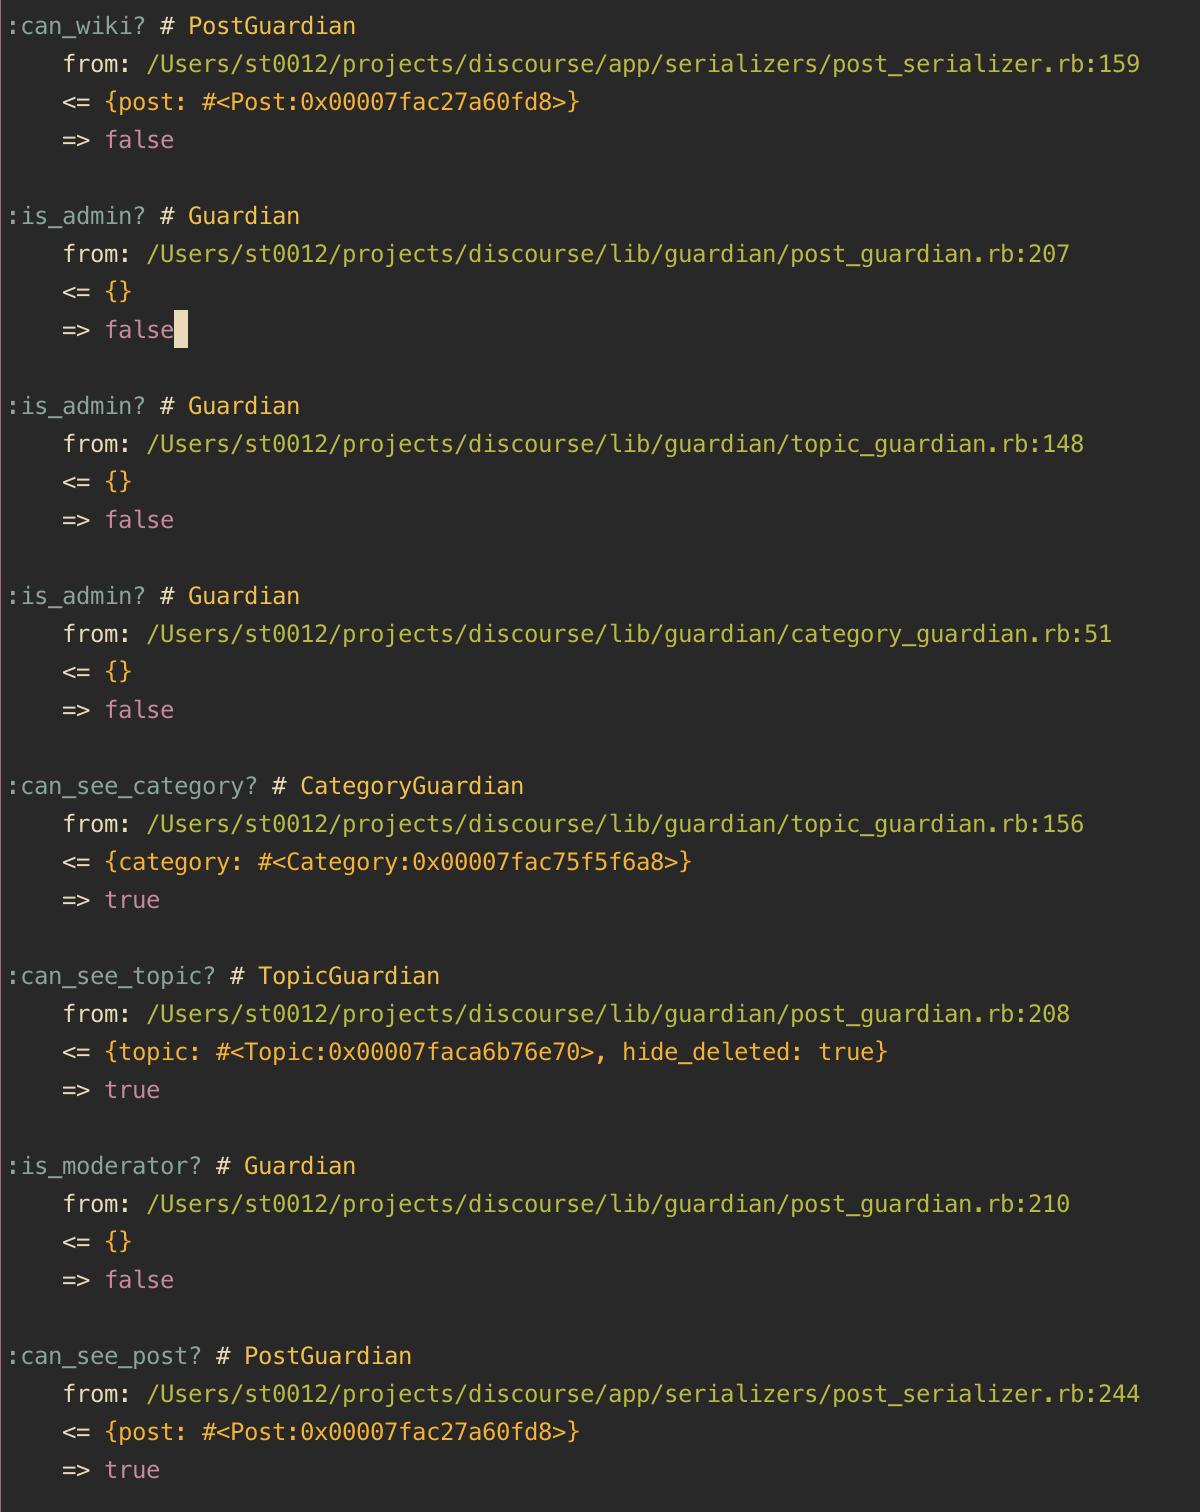 image of print_calls output